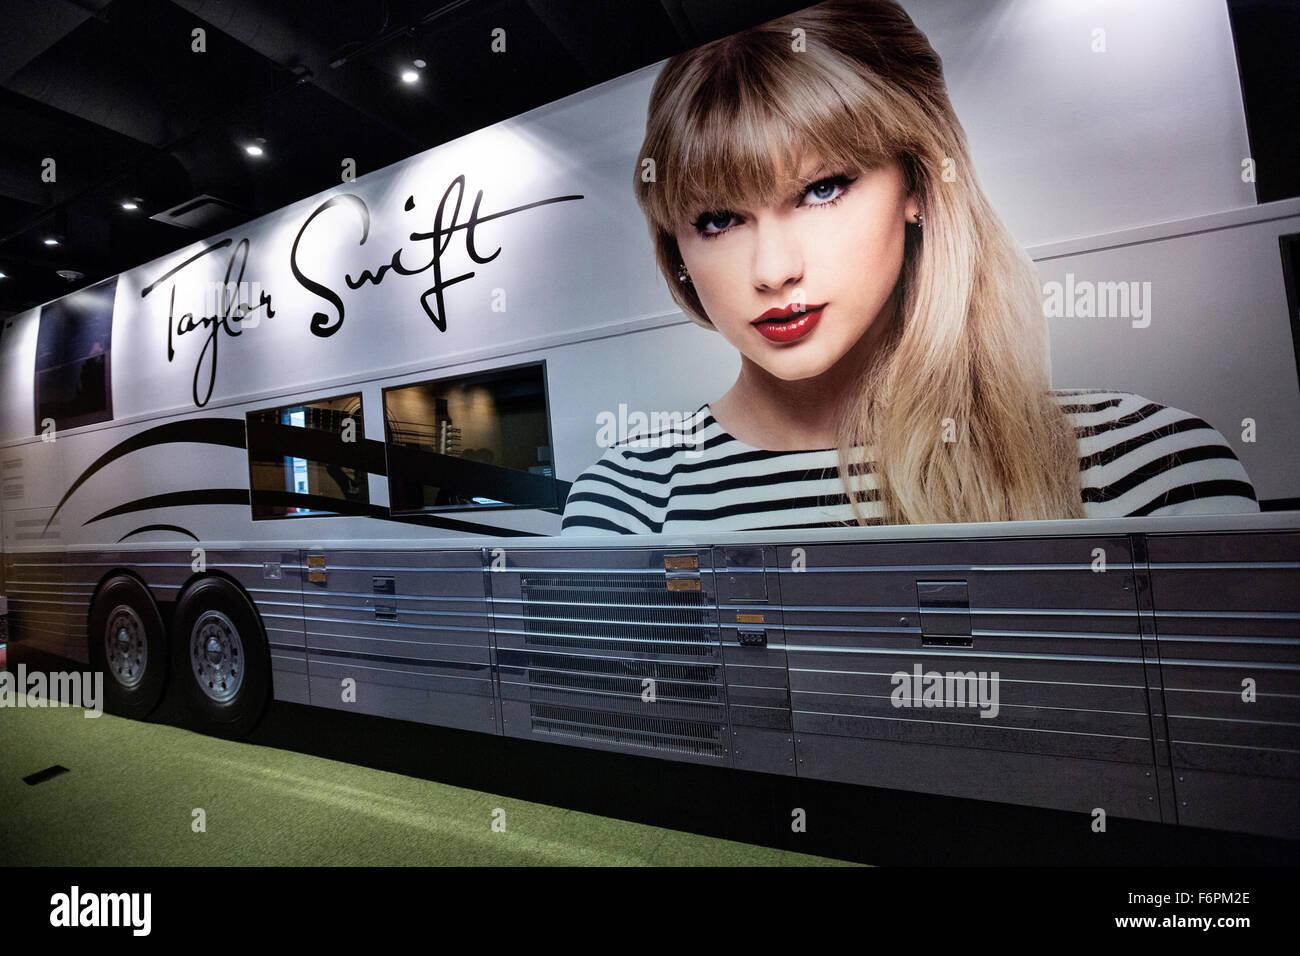 Display del cantante Talyor Swift tour bus sul display nella Country Music Hall of Fame a Nashville, TN. Immagini Stock